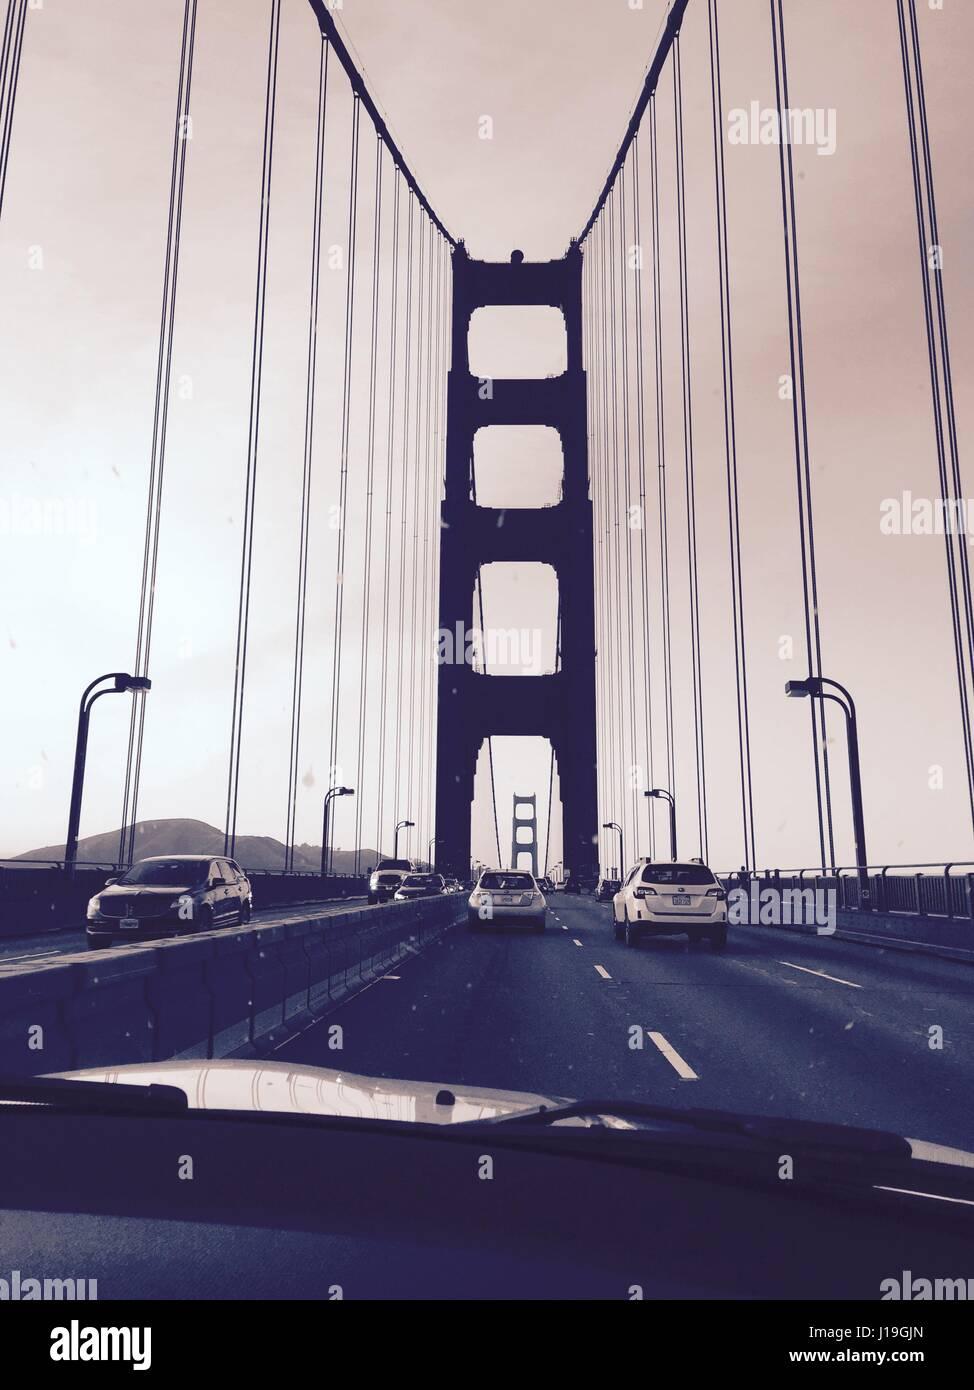 Tracing the Golden Gate Bridge - Stock Image